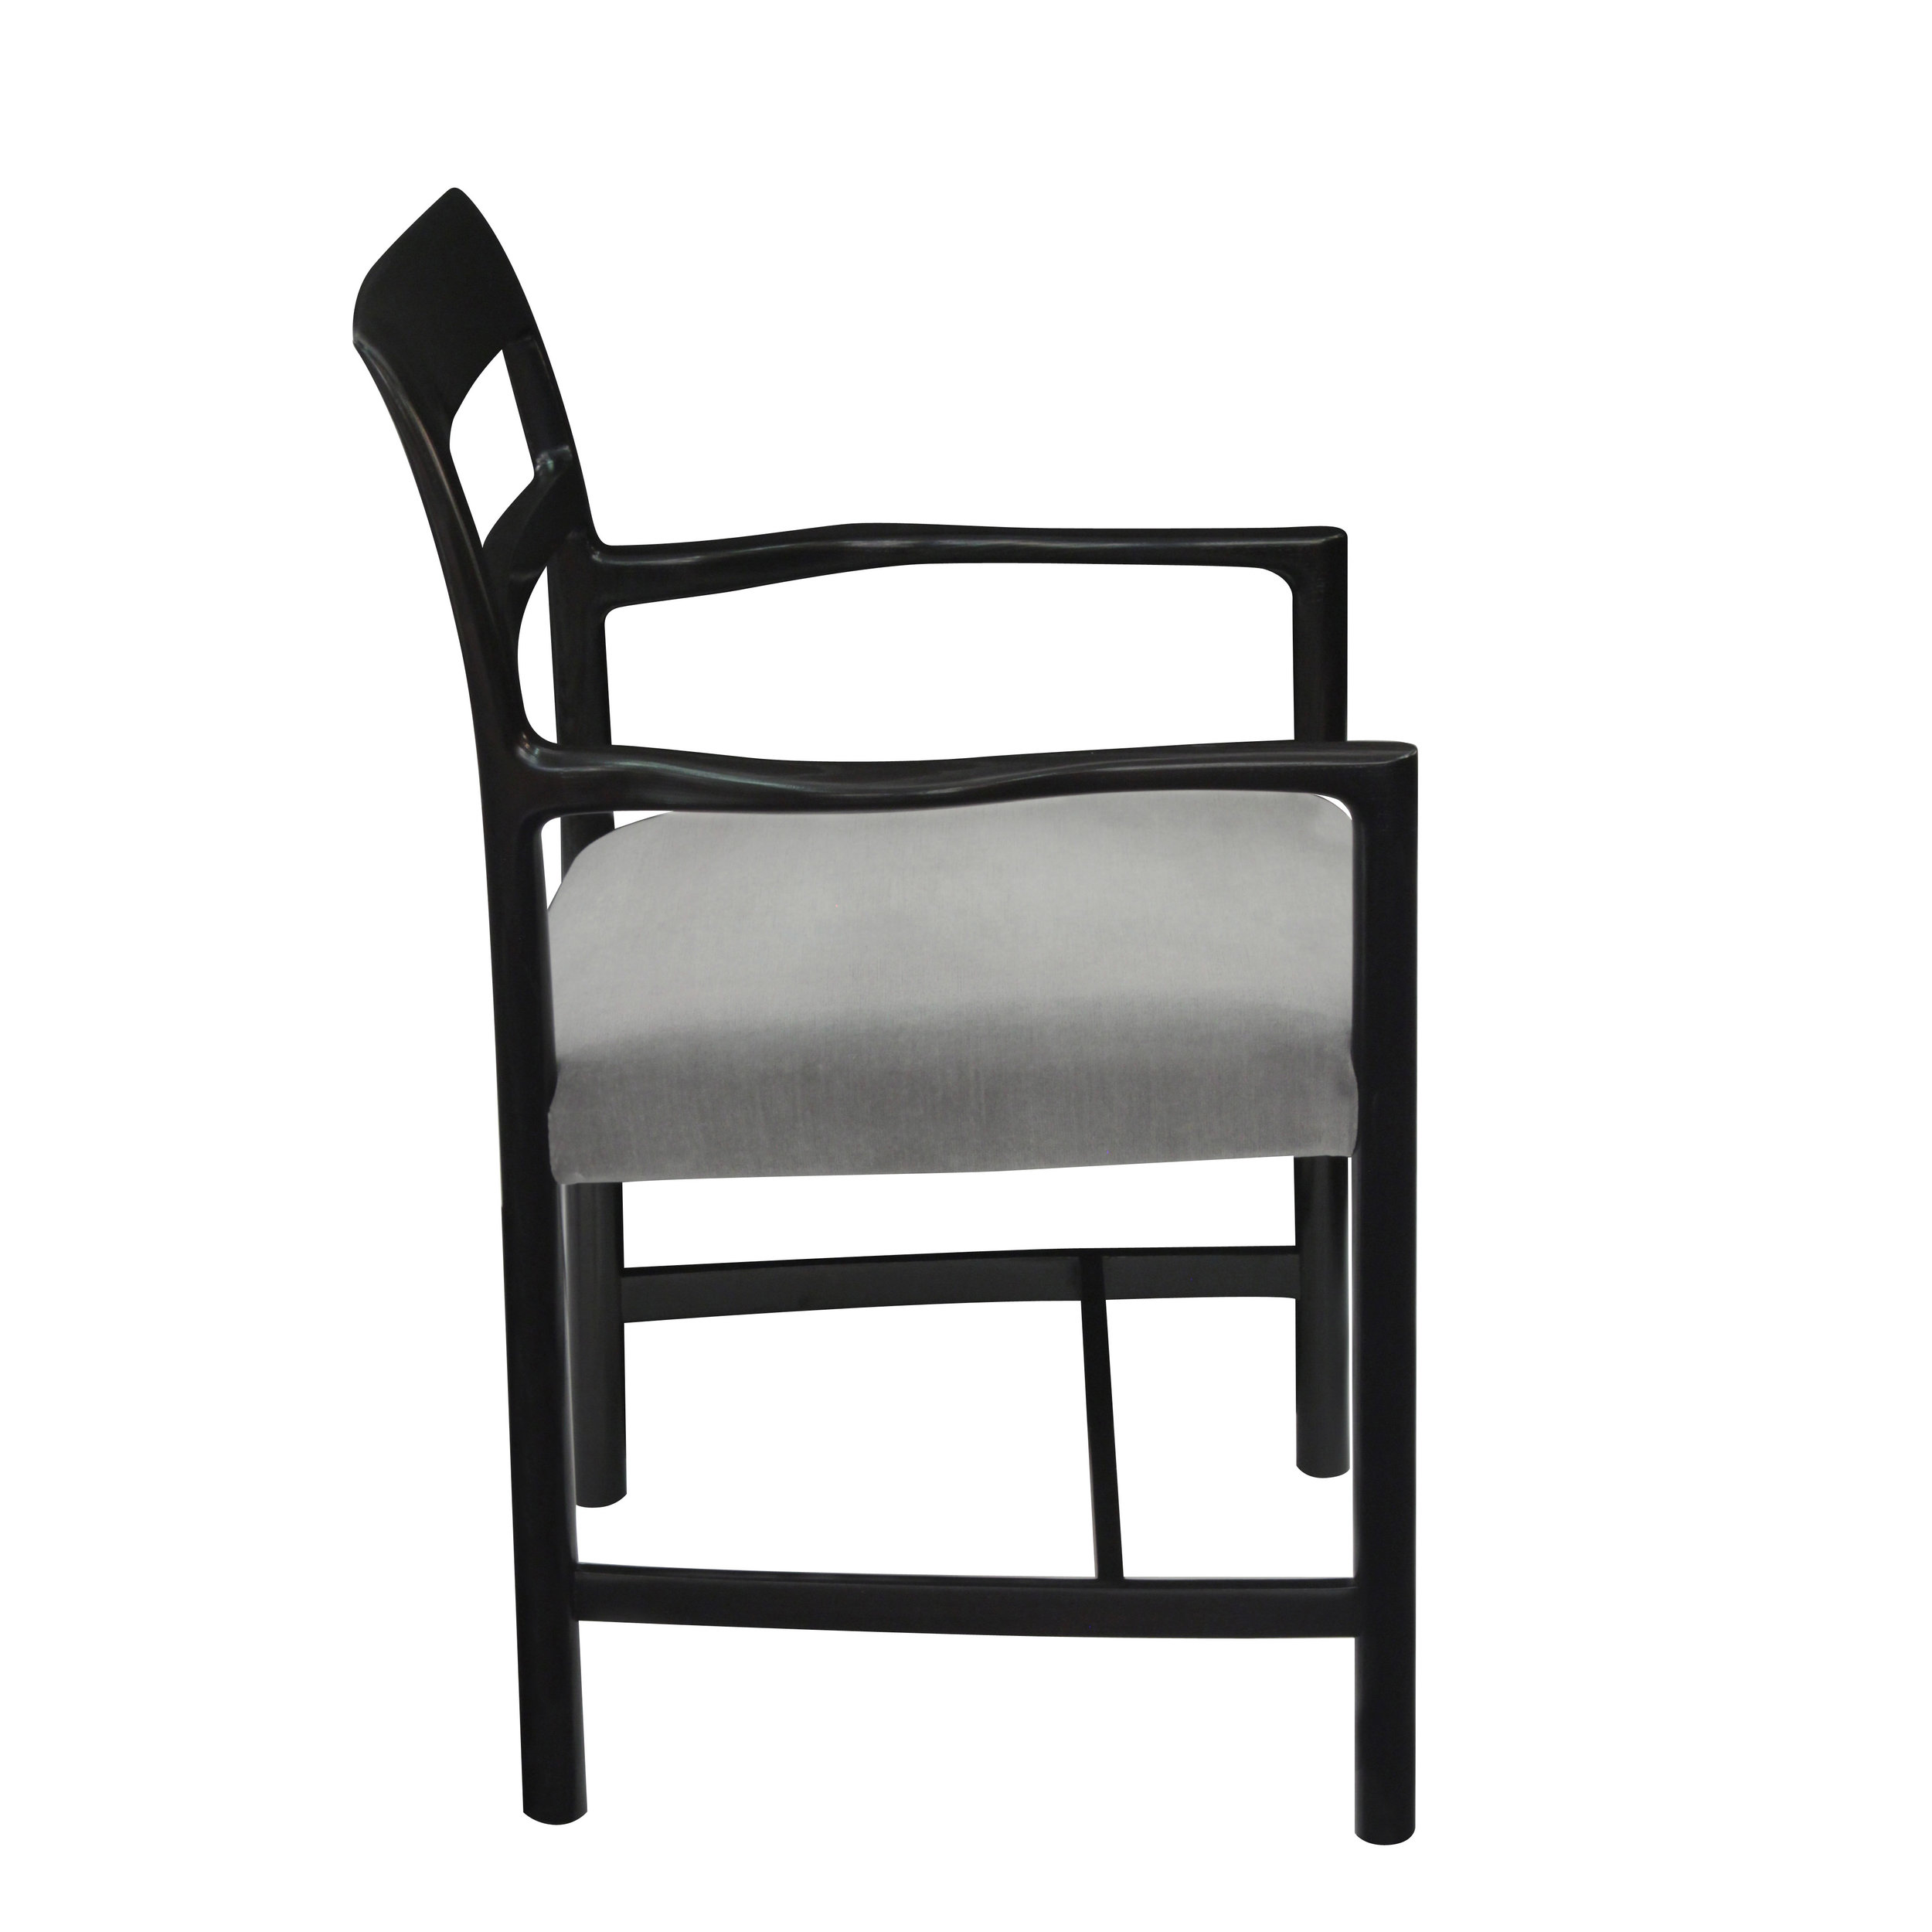 Dunbar 150 setof8 drk ash diningchairs151 detail2 hires.jpg